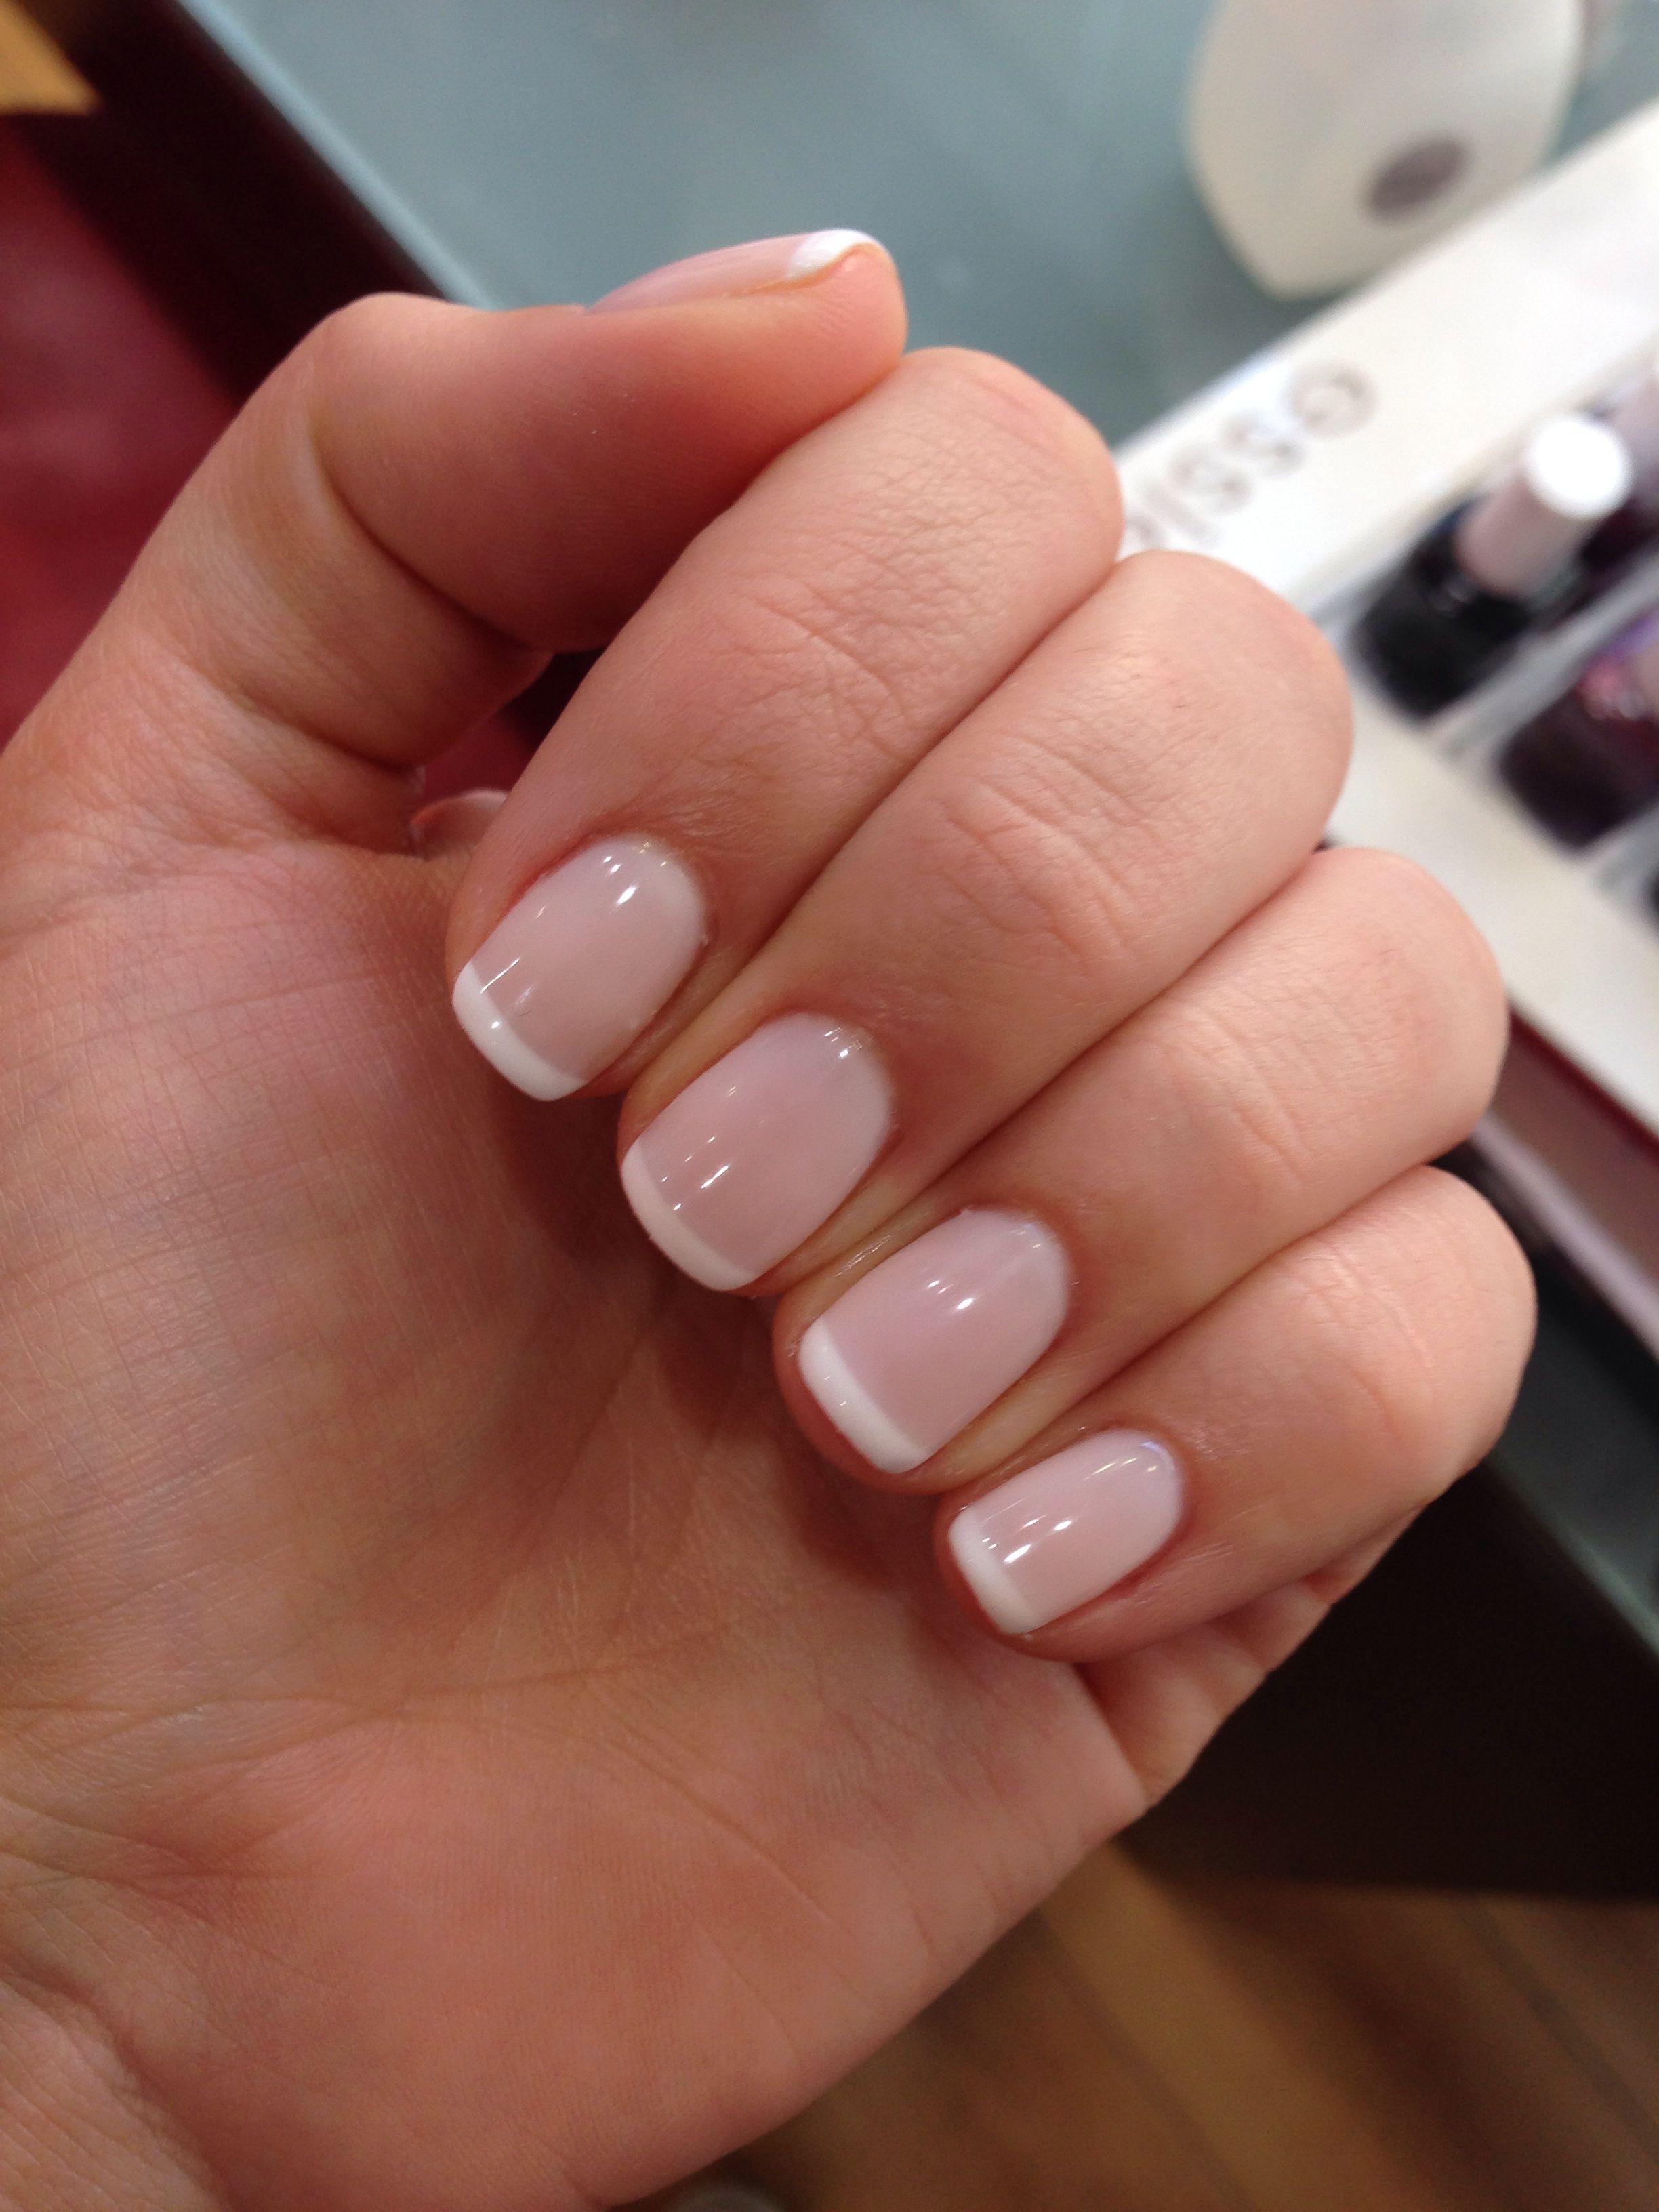 French Manicure With Images Ladne Paznokcie Kolorowe